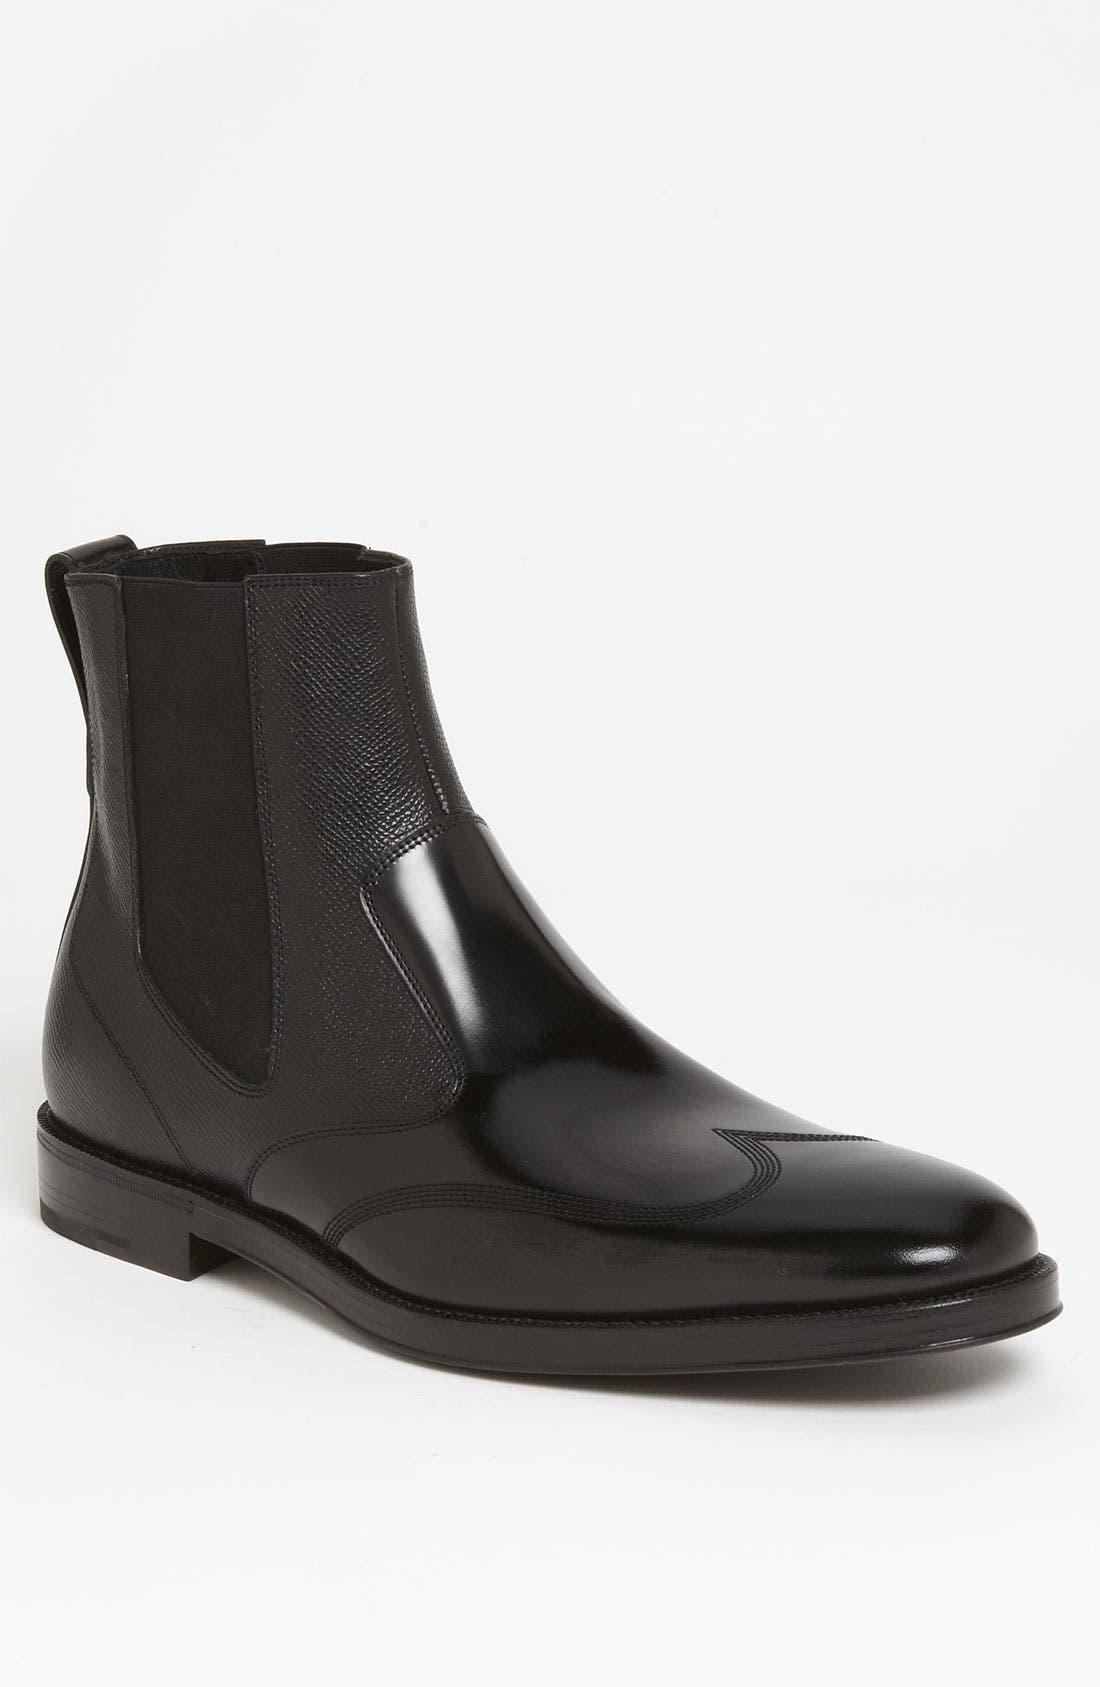 Alternate Image 1 Selected - Salvatore Ferragamo 'Aritz' Wingtip Chelsea Boot